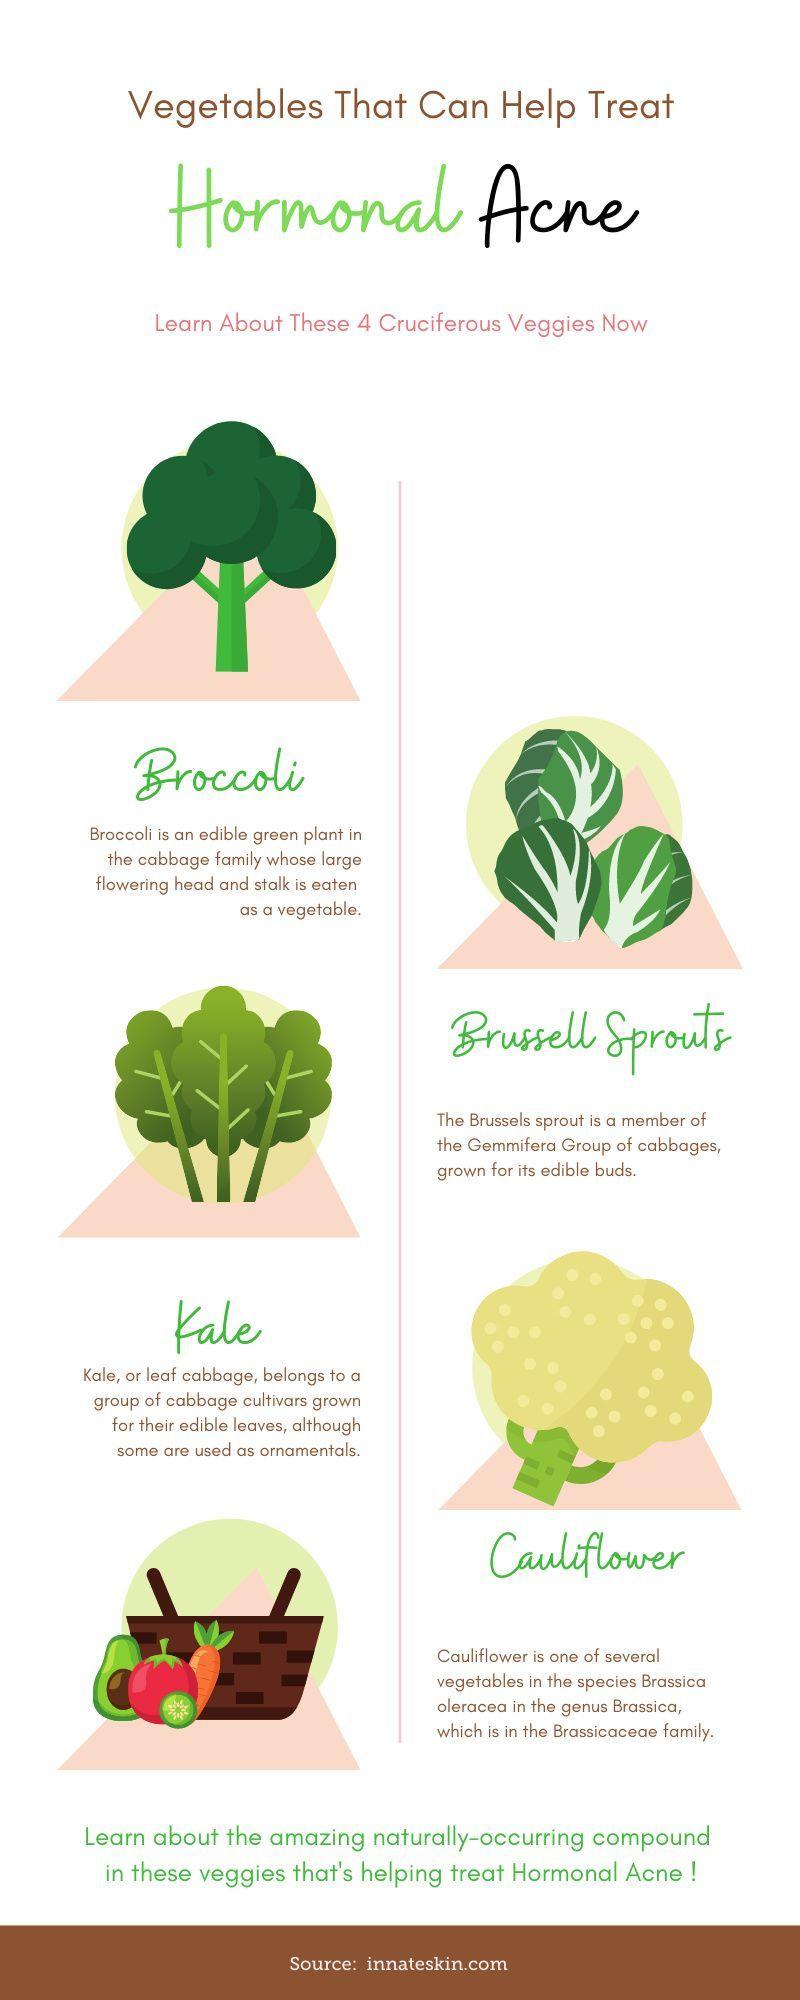 Innateskin says having these four vegetables can help treat hormonal acne.   #hormonalacne #hormonalacnetreatment #hormonalacnefood #hormonalacneremedies #hormonalacnediet